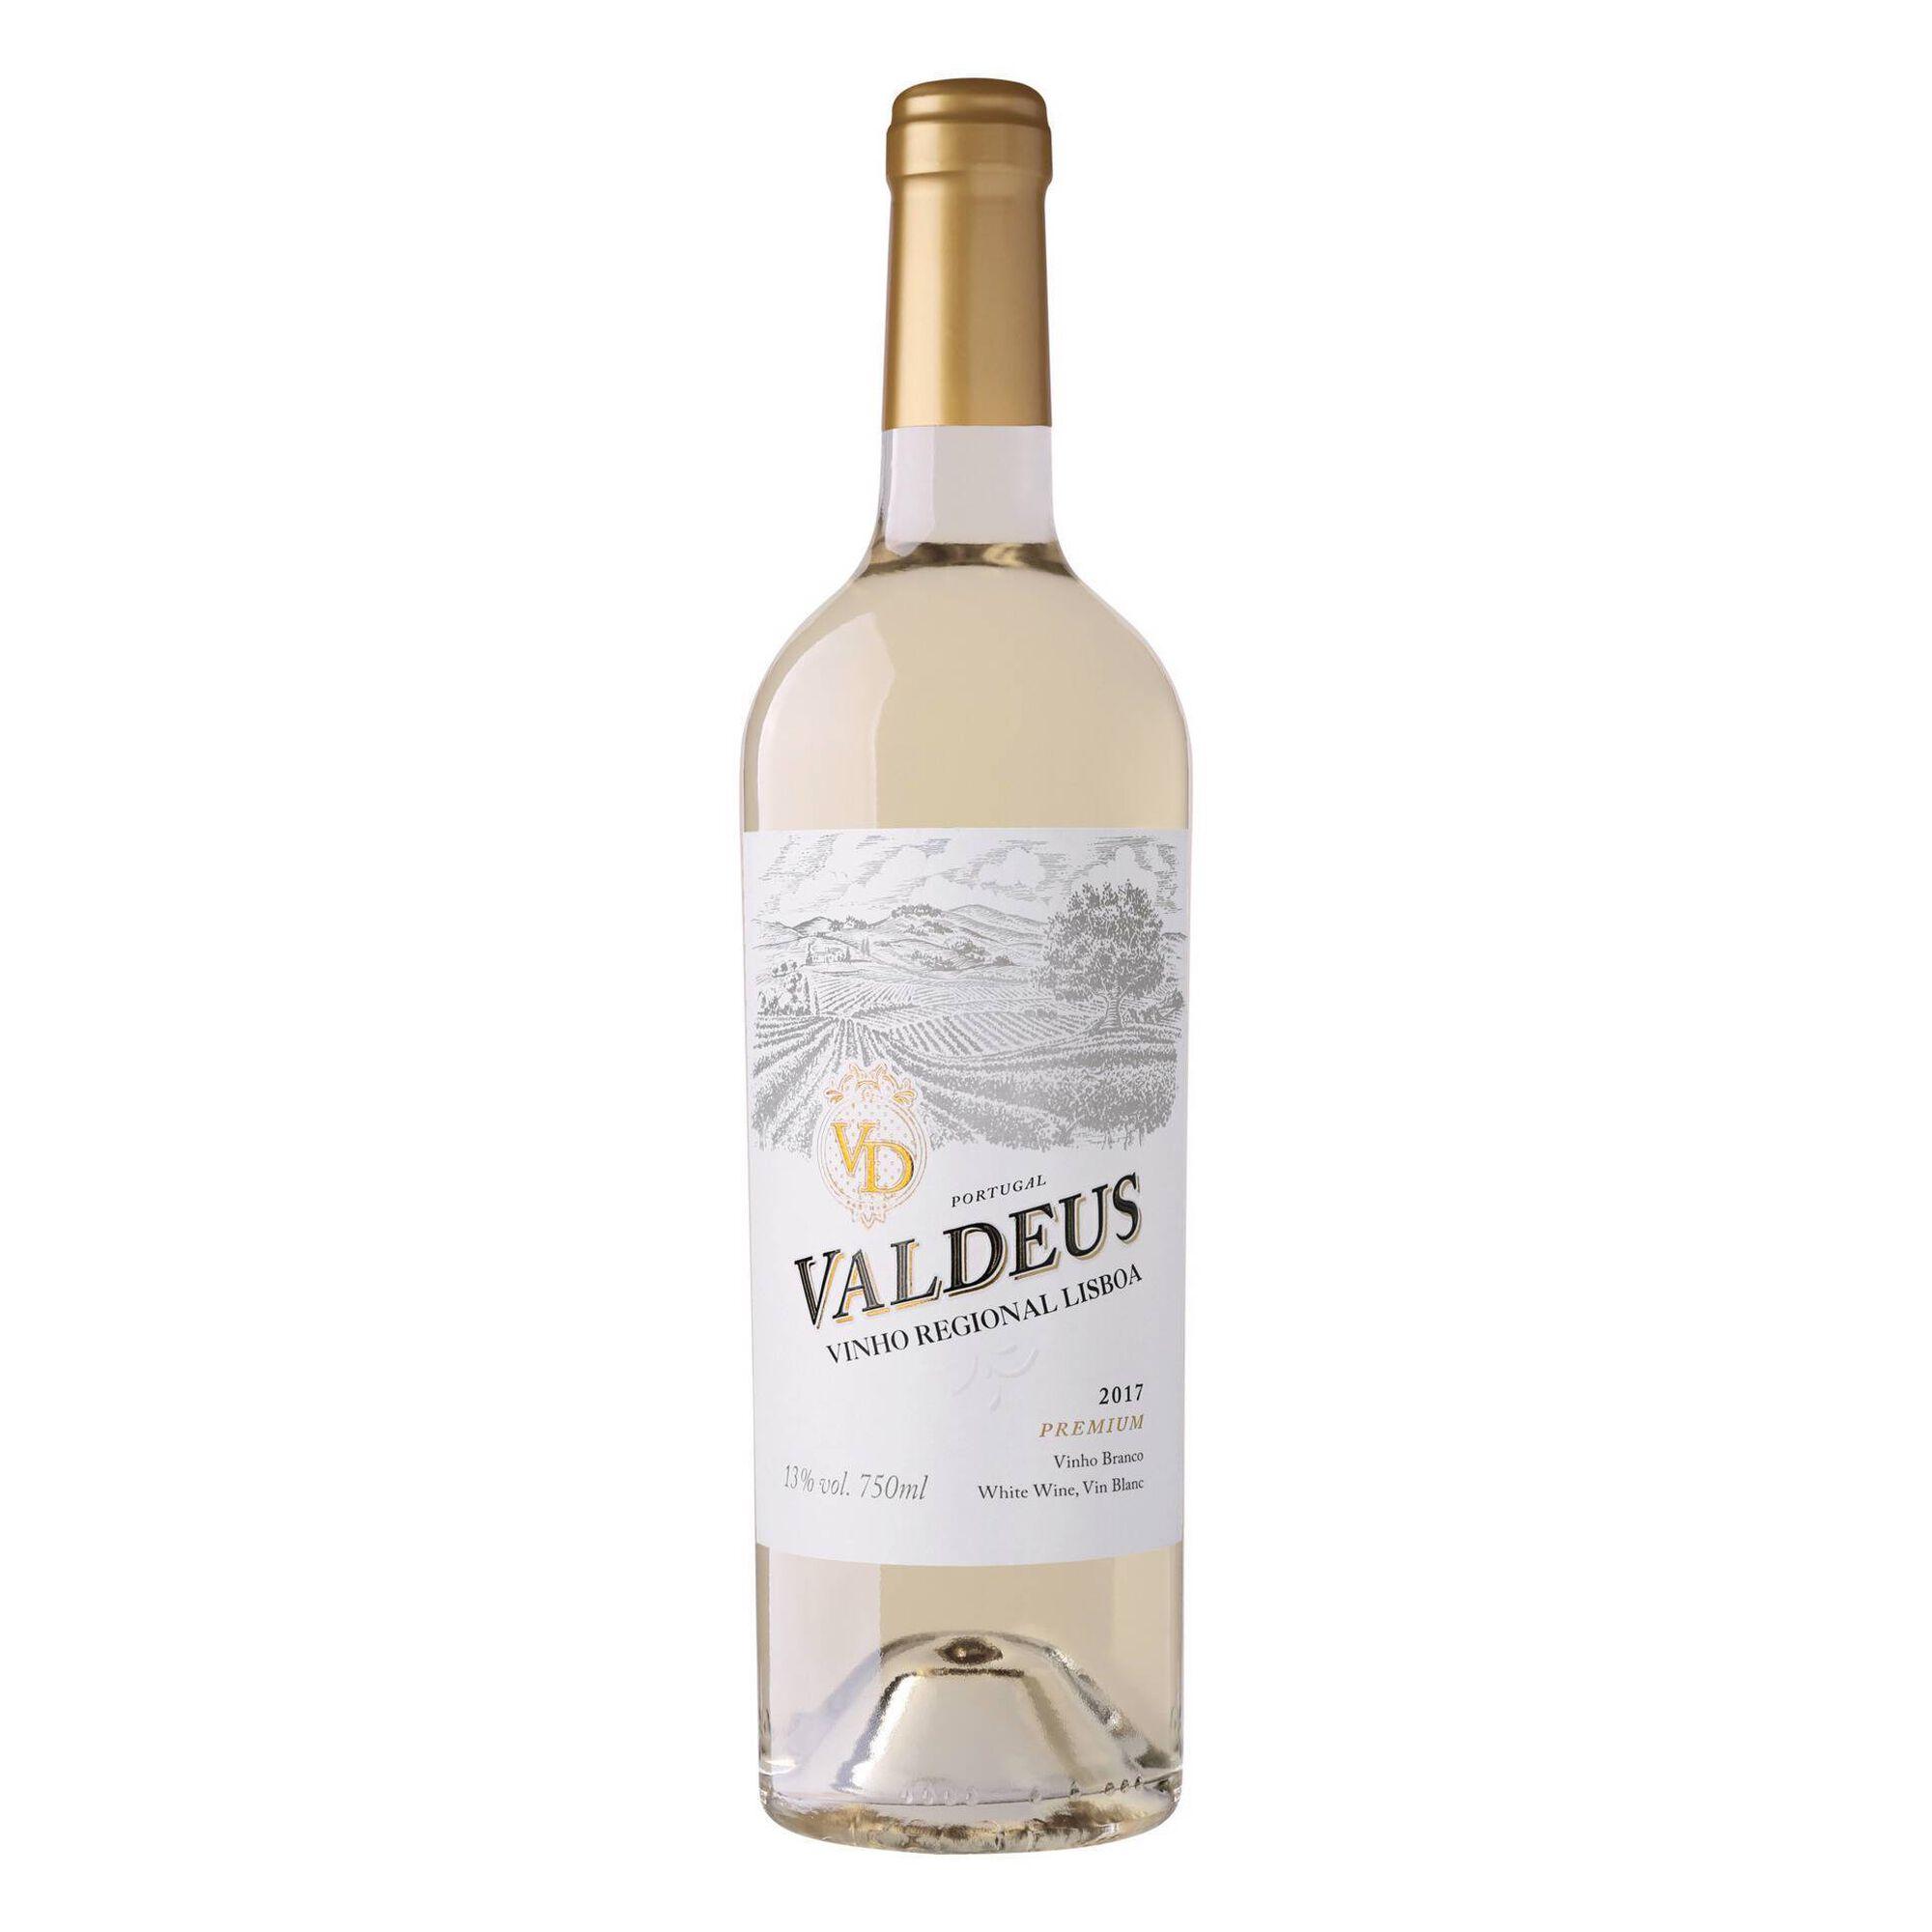 Valdeus Premium Regional Lisboa Vinho Branco